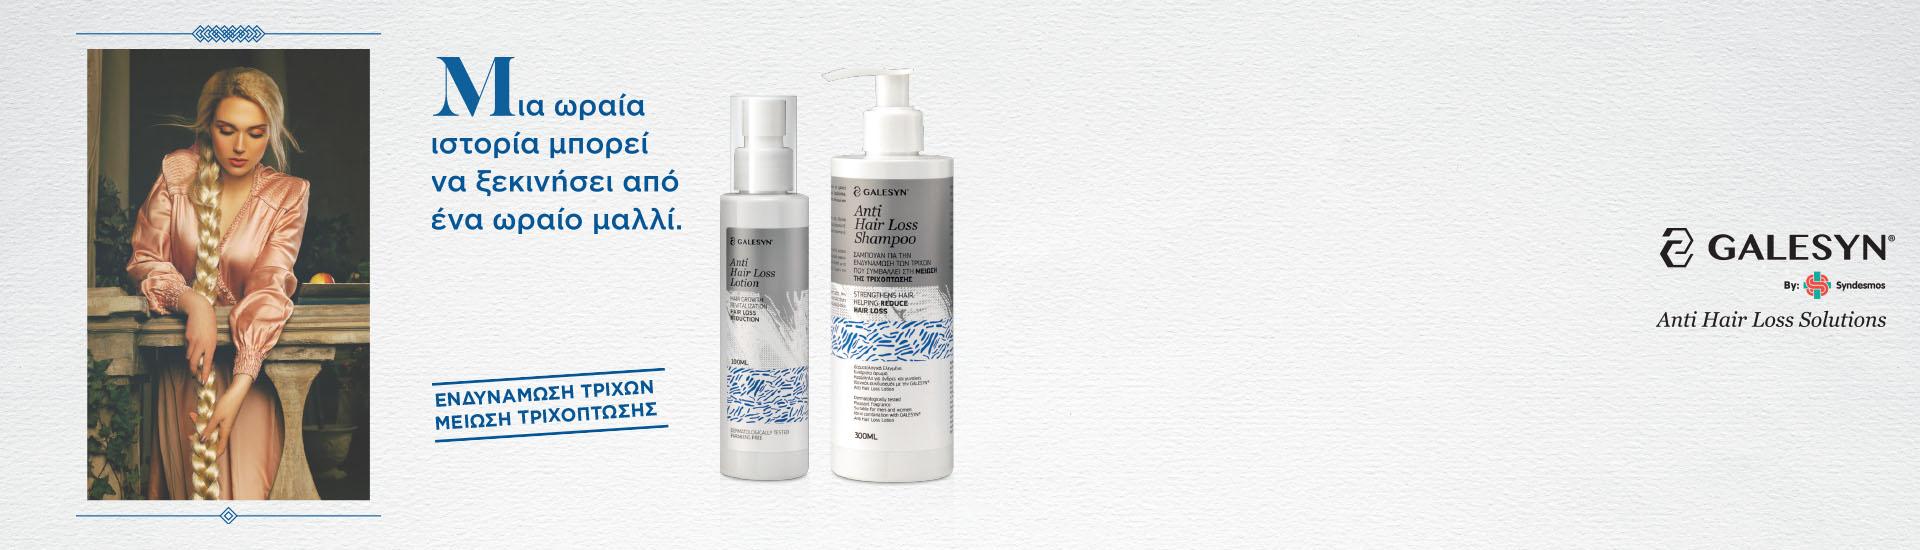 GALESYN ANTI-HAIR LOSS SOLUTIONS